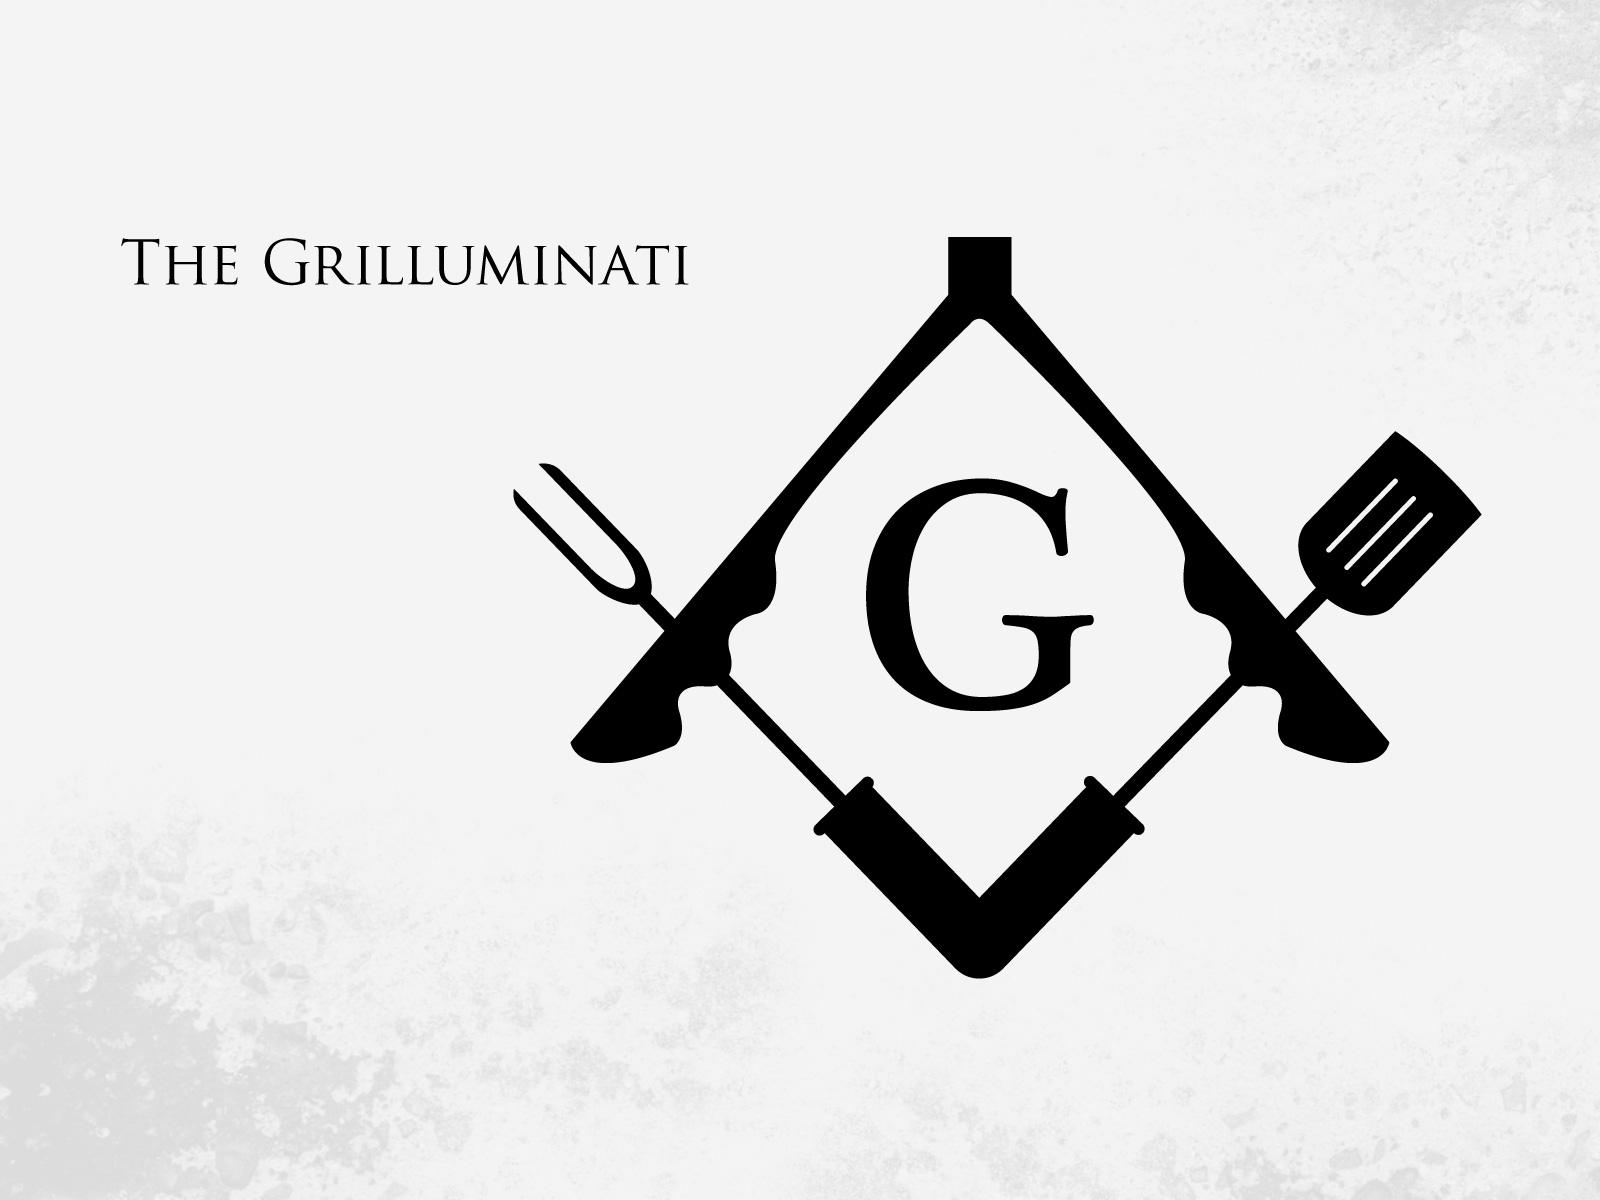 Grilluminati.jpg